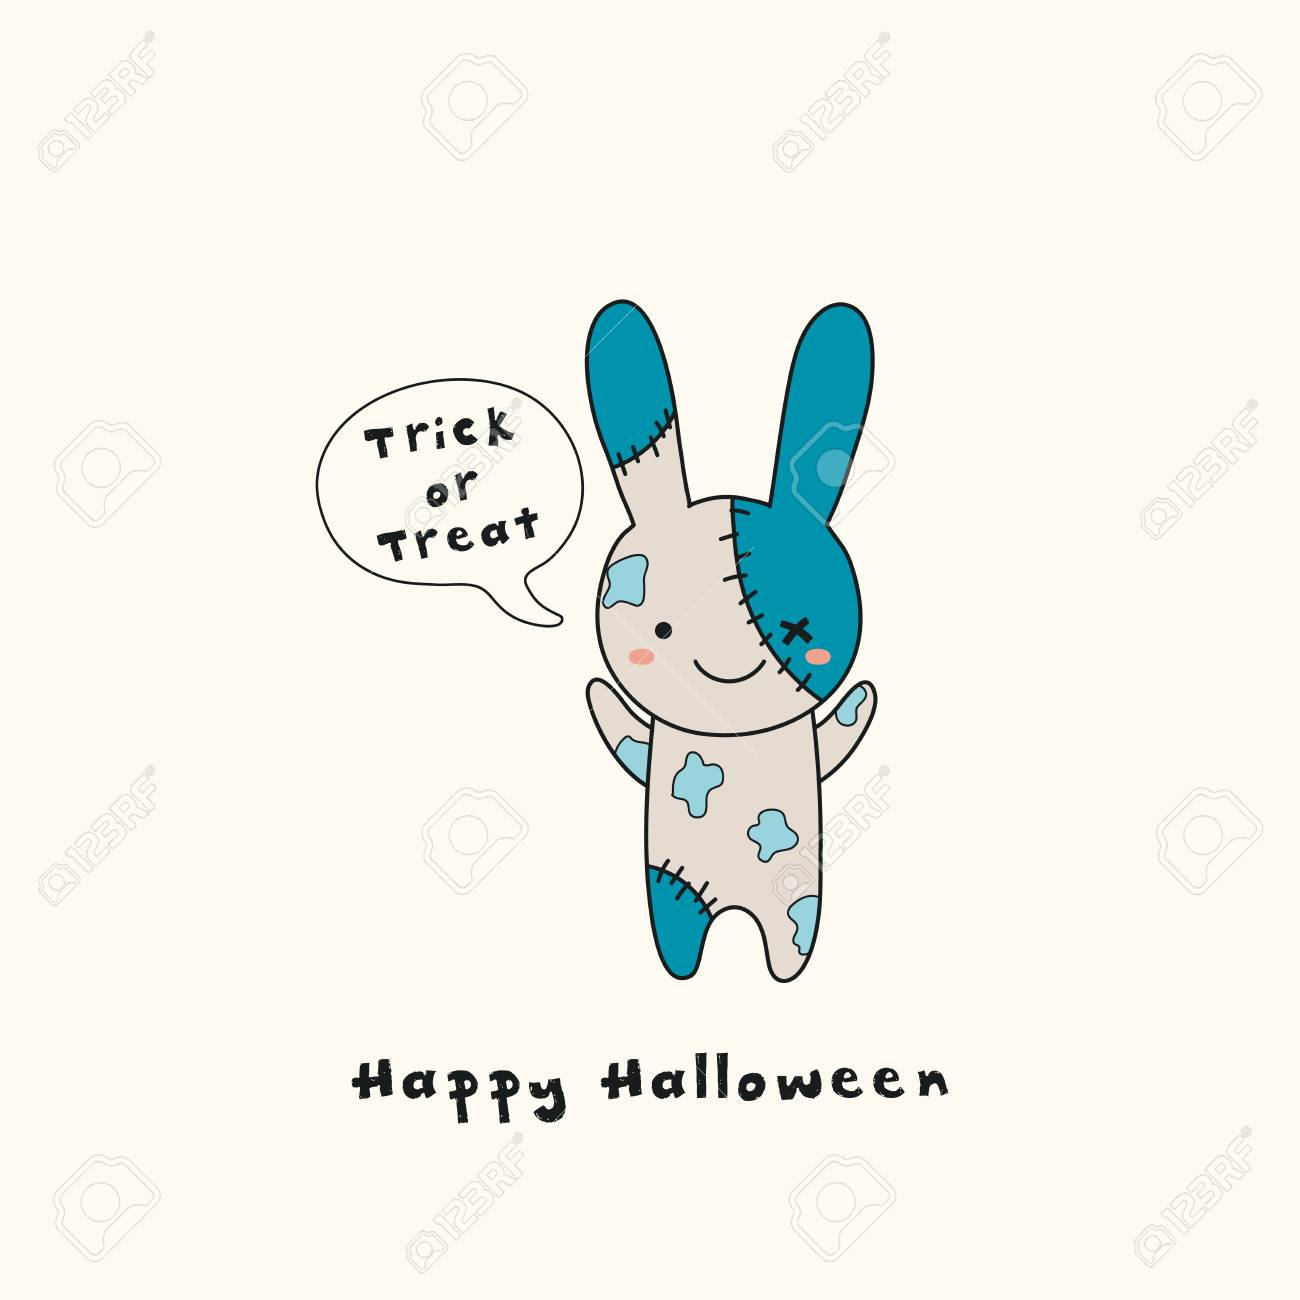 Hand Drawn Vector Illustration Of A Kawaii Funny Zombie Bunny